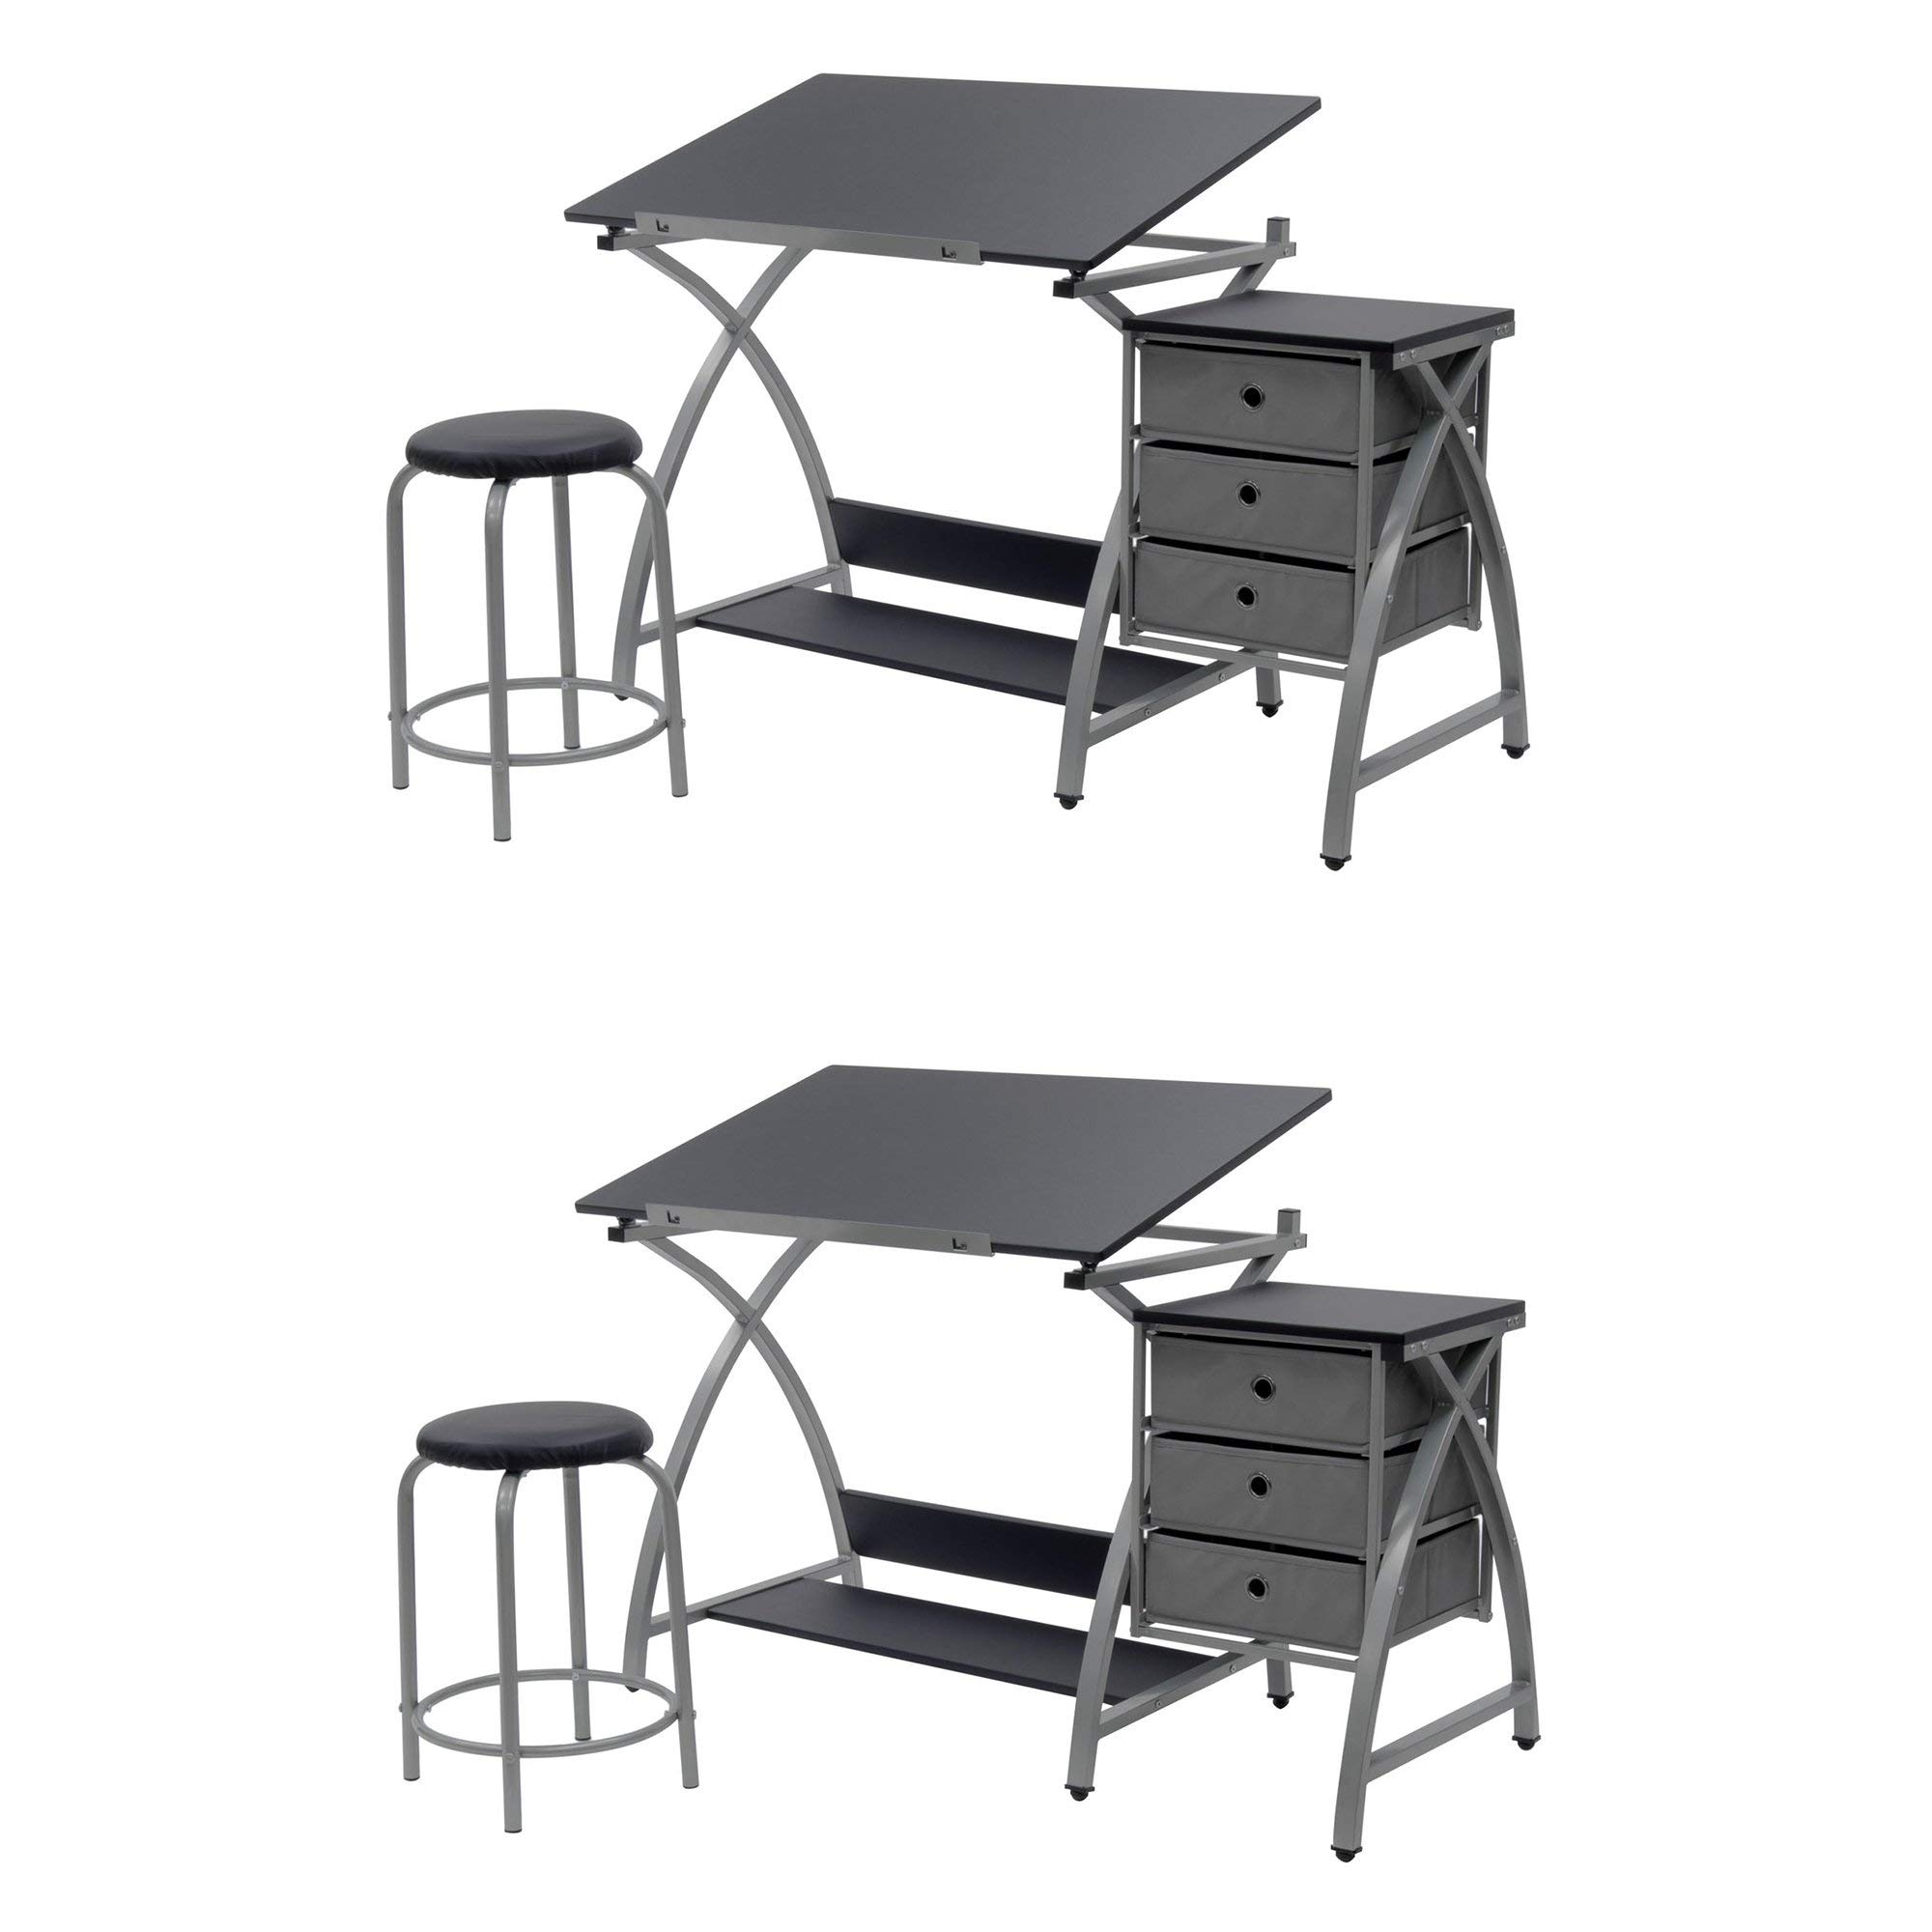 Studio Designs Laminate Craft Table Comet Center with Stool, Black (2 Pack) by STUDIO DESIGNS INSPIRING CREATIVITY WWW.STUDIODESIGNS.COM (Image #1)